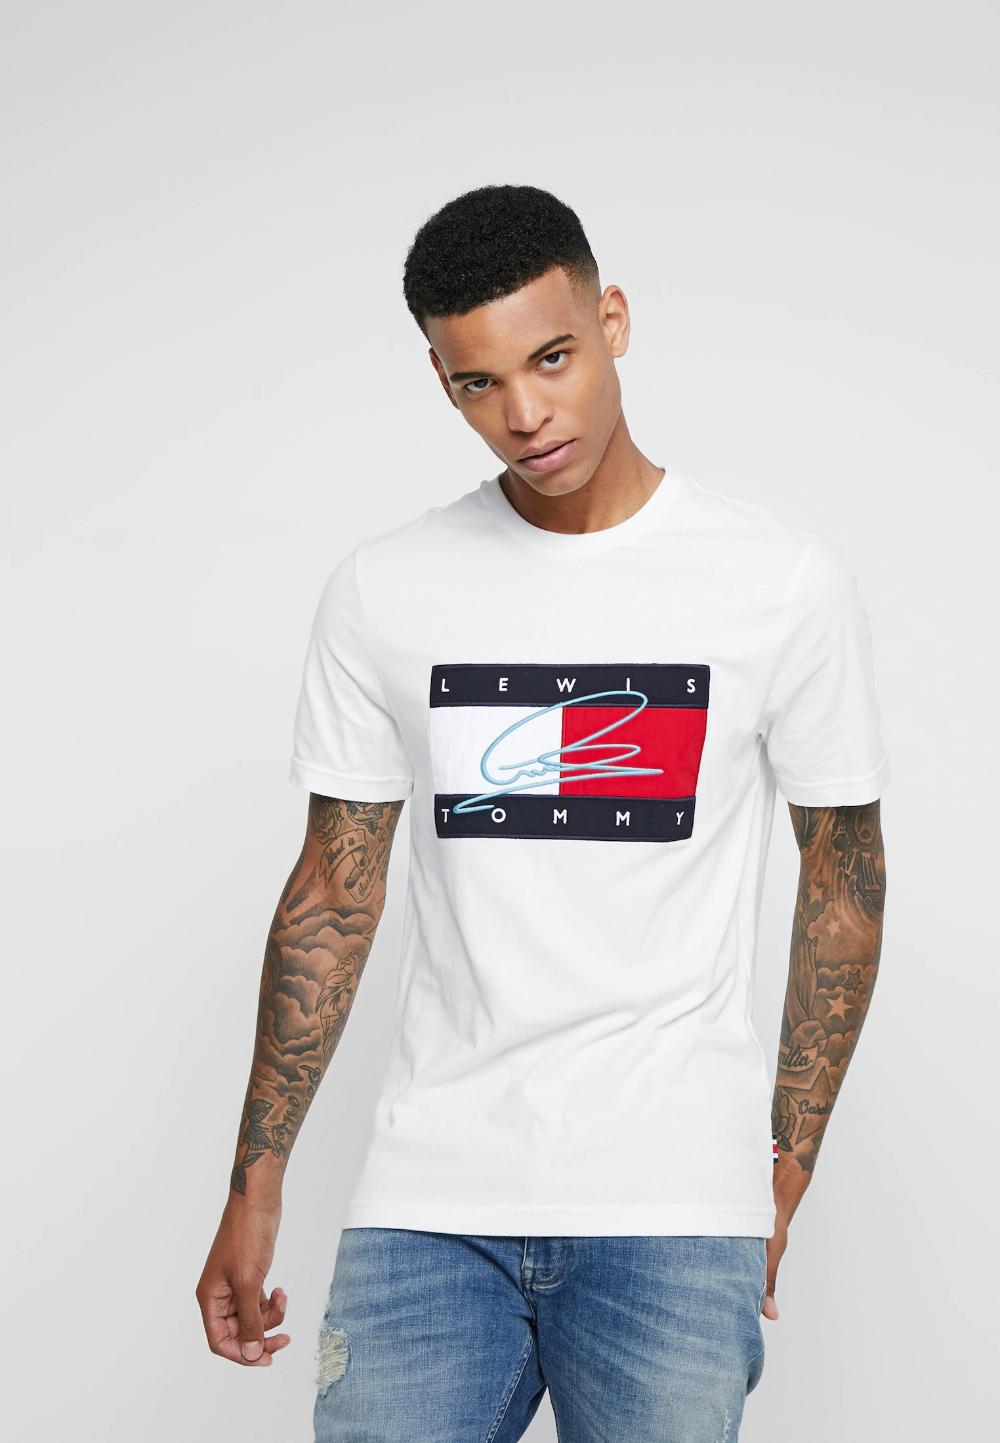 Lewis Hamilton Rwb Signature Logo Tee Camiseta Estampada White Zalando Es Camiseta Tommy Hilfiger Camiseta Estampada Ropa De Hombre